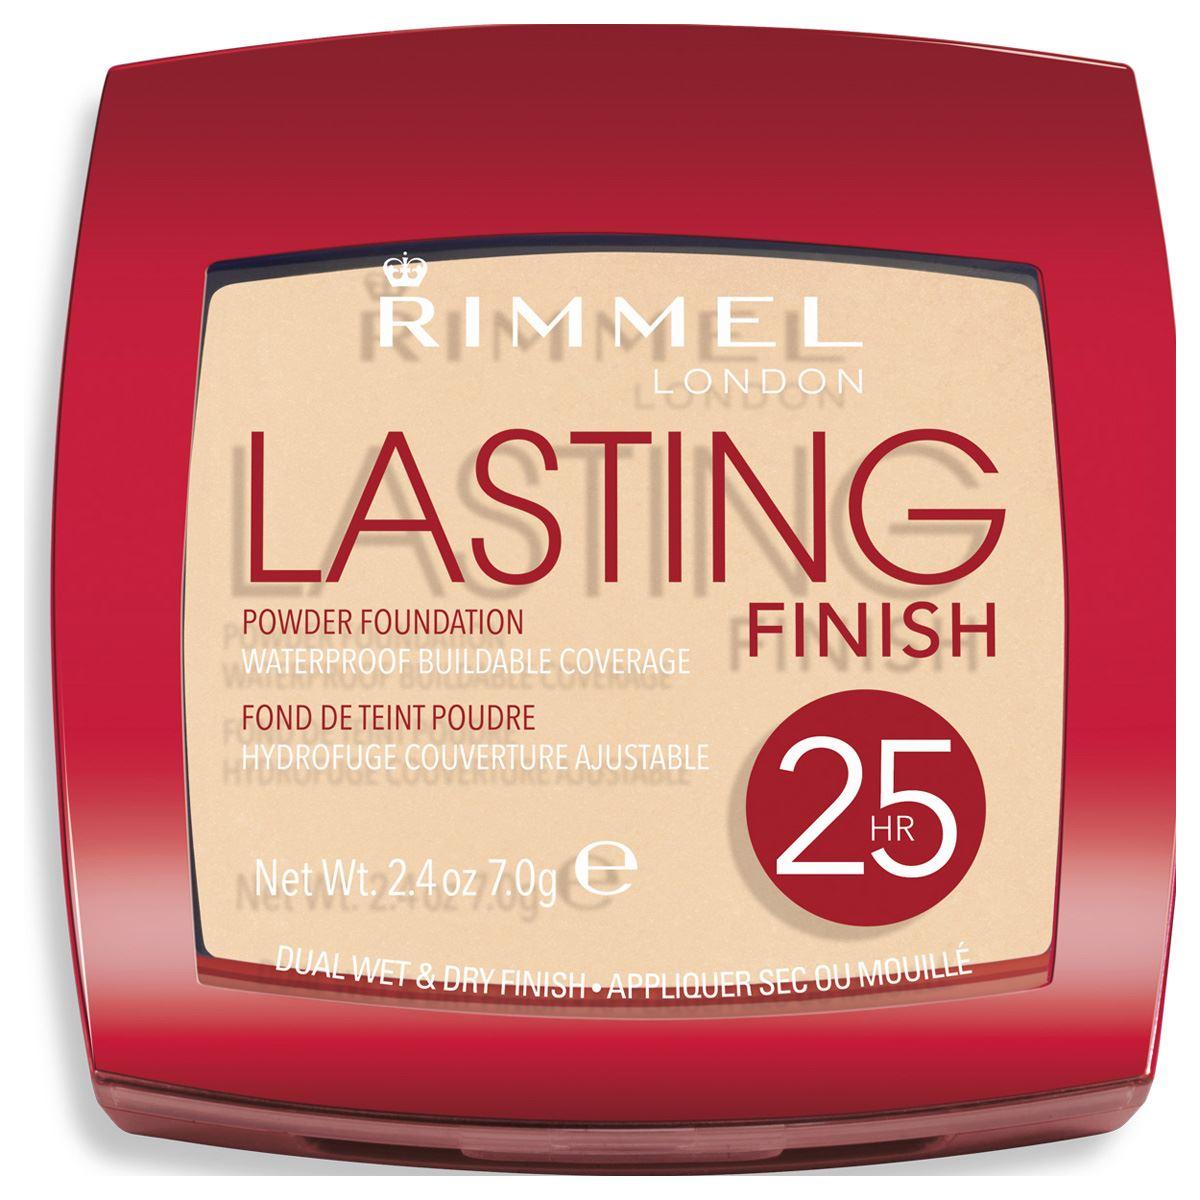 Lasting fin maquillaje polvera soft be rmm  - Sanborns